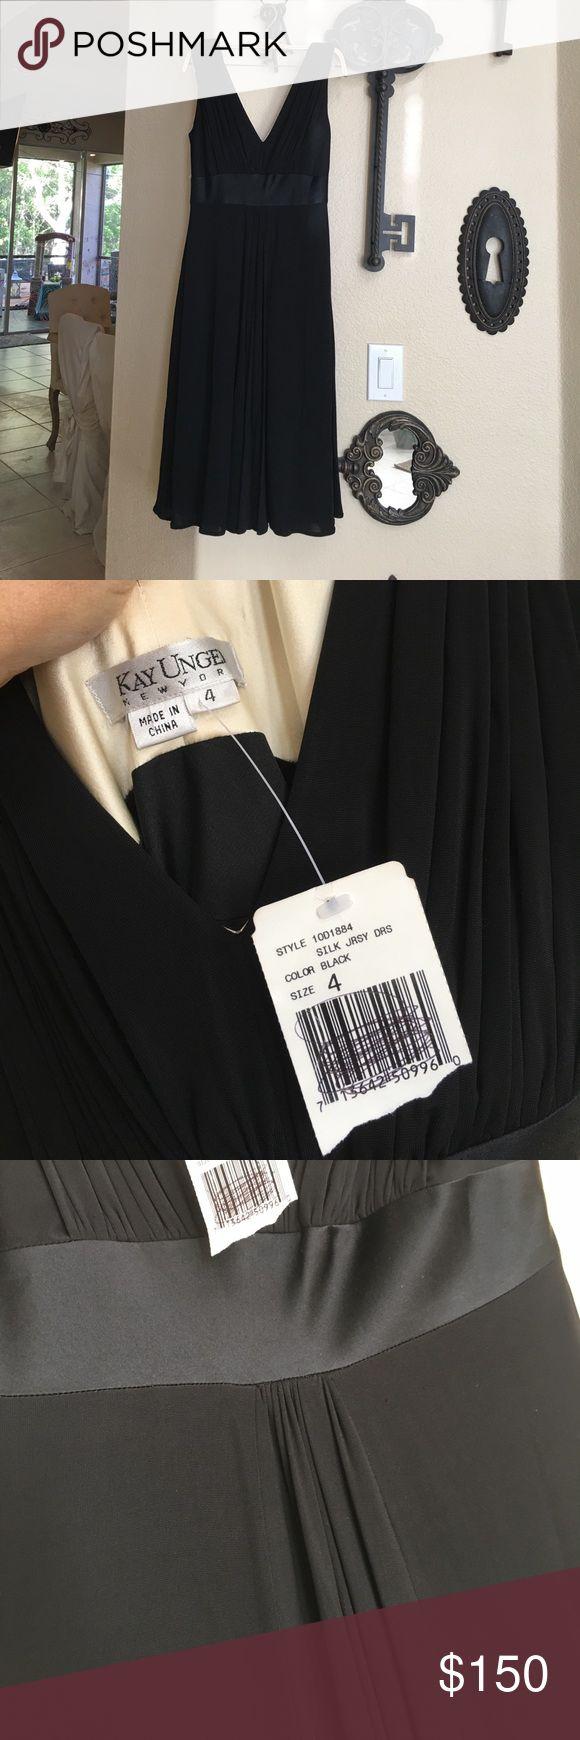 Kay Unger silk jersey dress NWT Kay Unger silk jersey dress NWT Kay Unger Dresses Midi